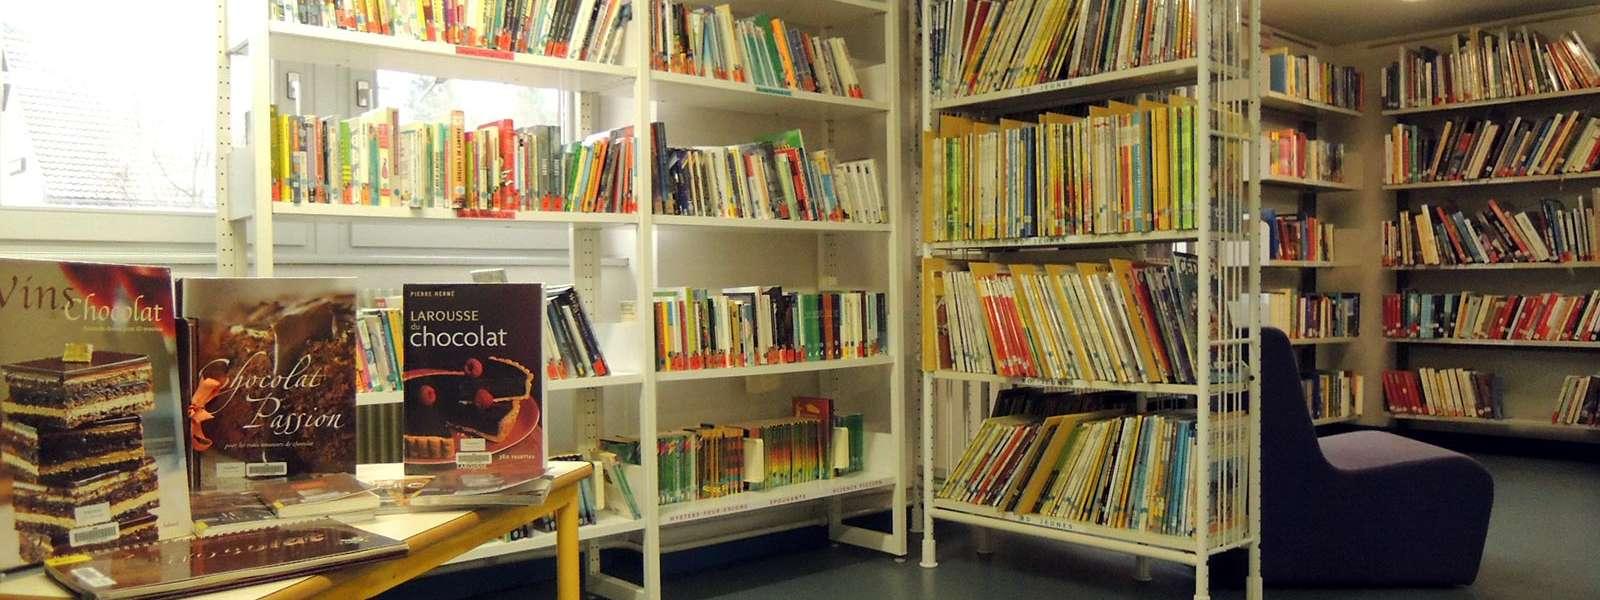 Bibliothèque, Niederbronn-les-Bains, Alsace